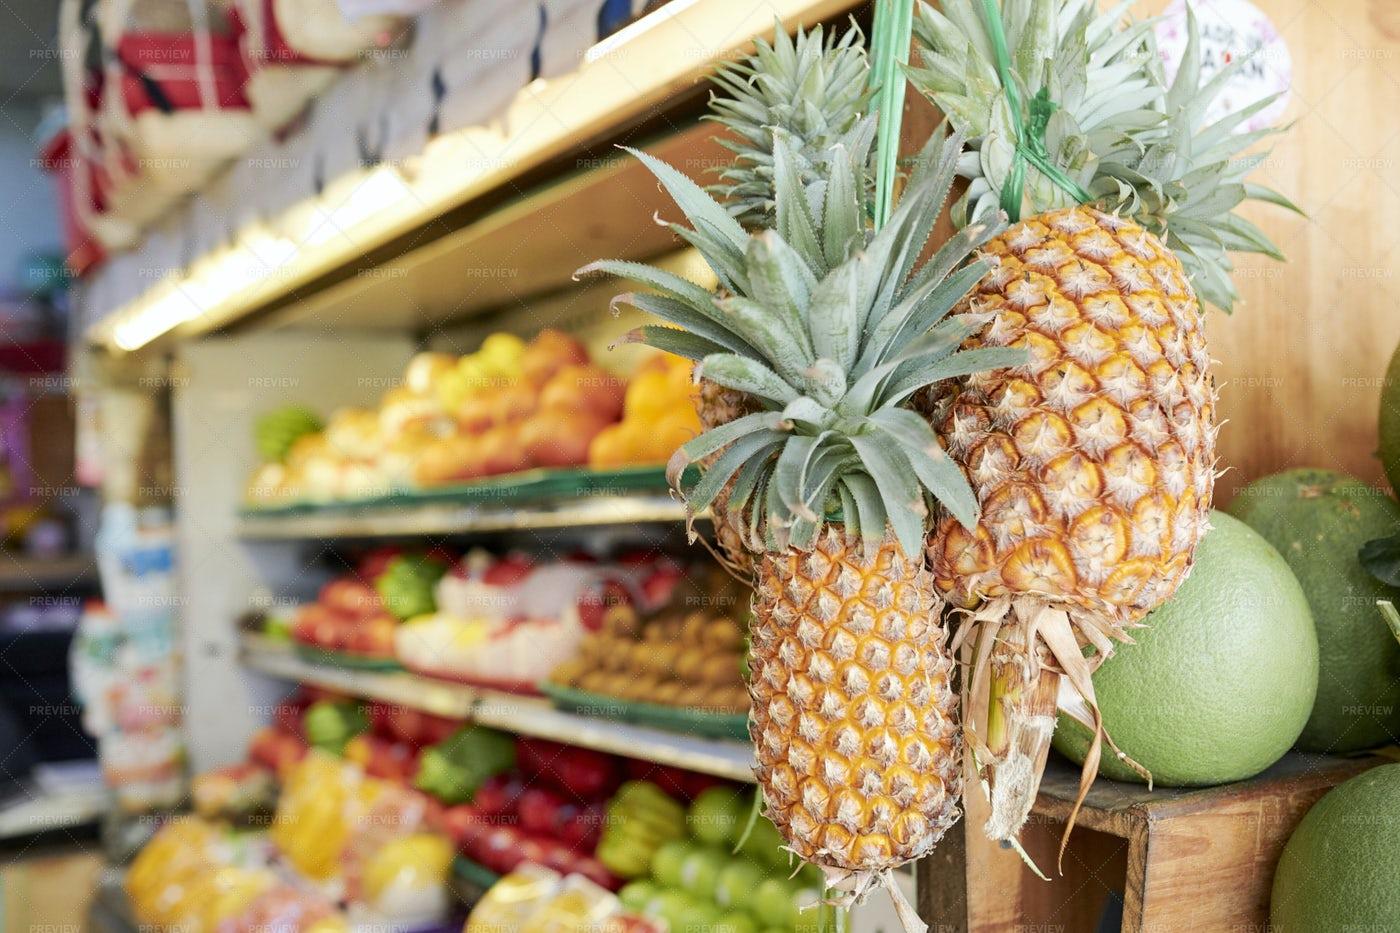 Pineapples Handing On Store Display: Stock Photos